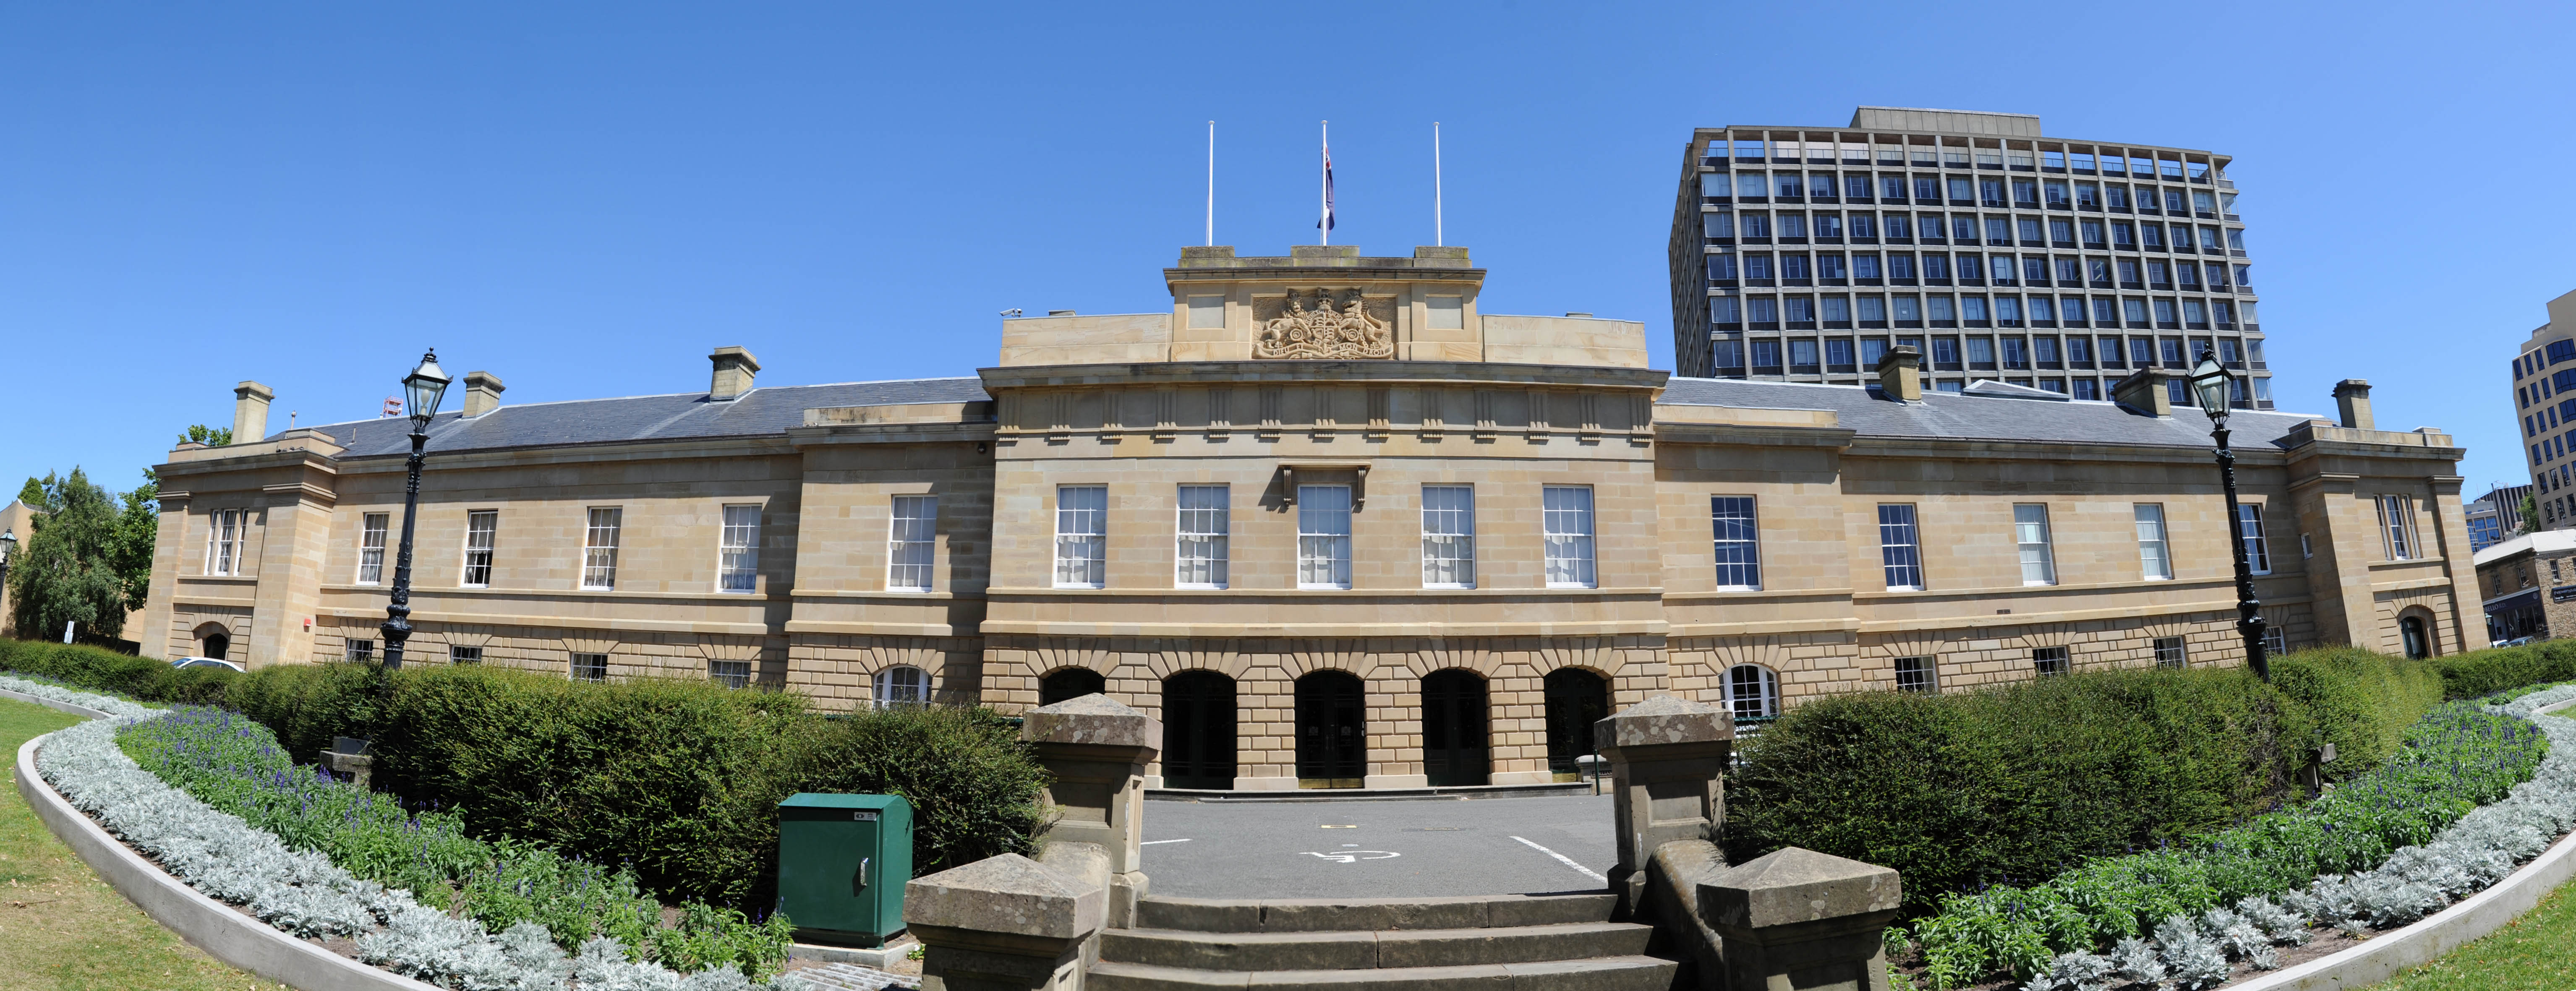 Tasmania Parliament House Hobart